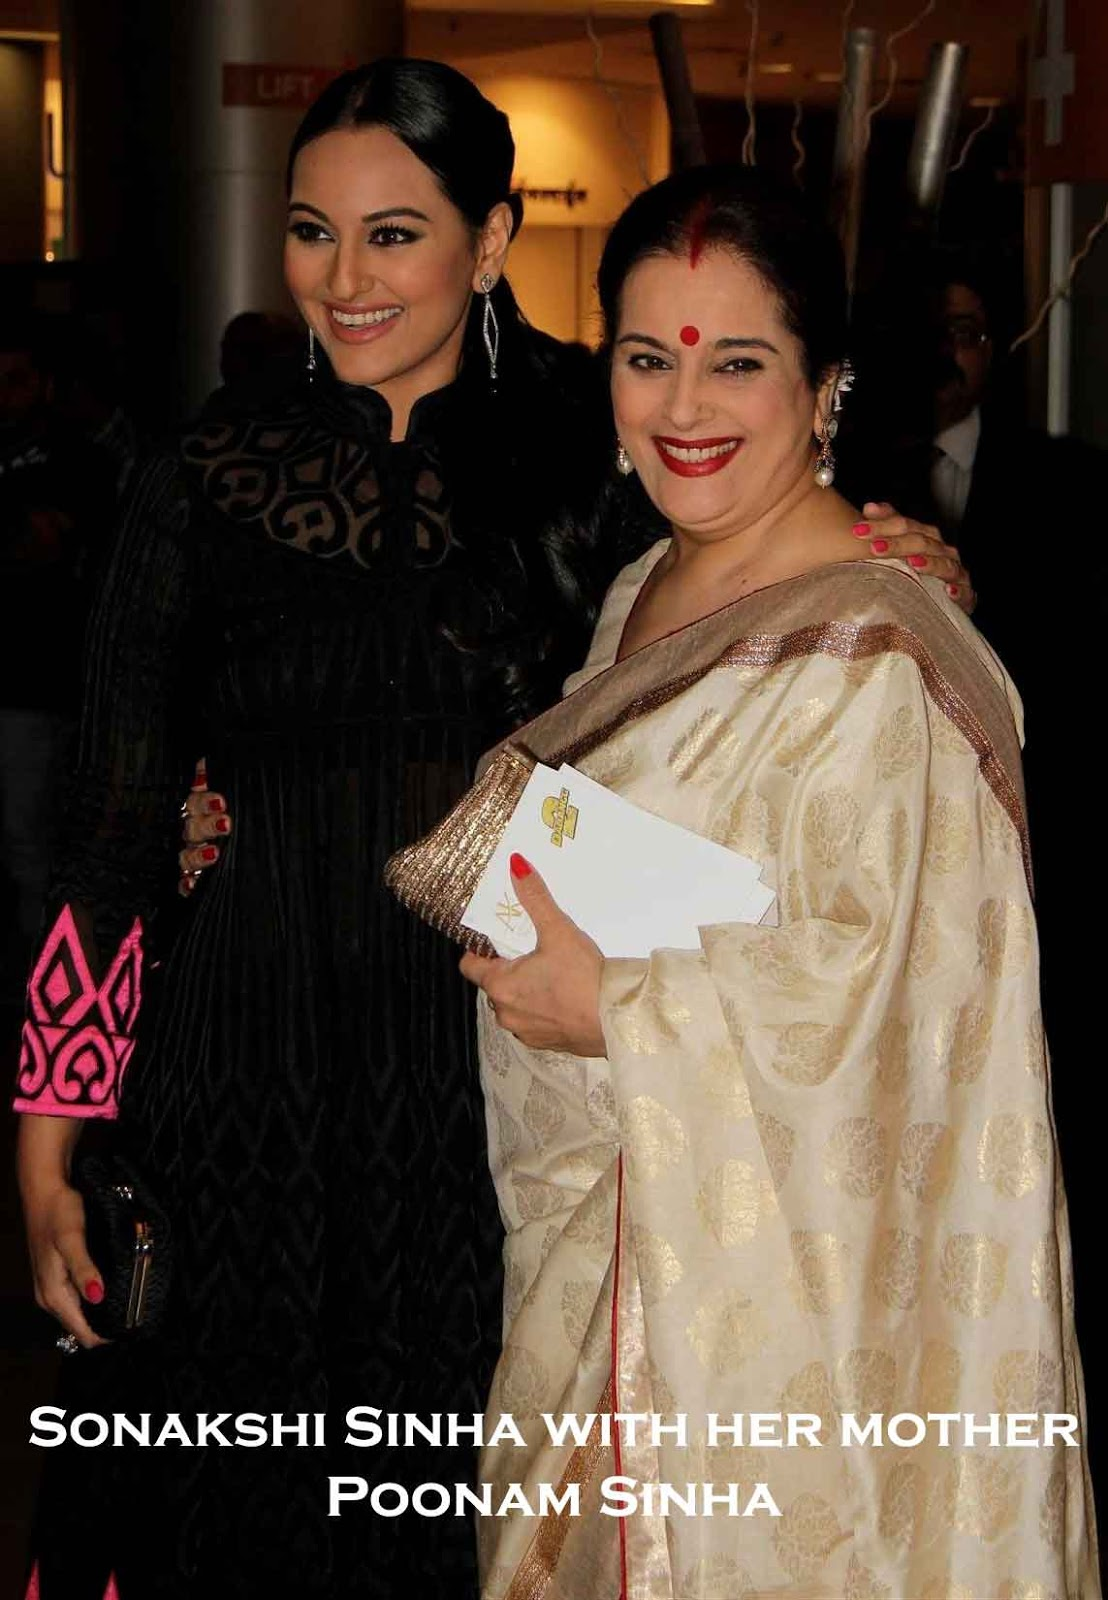 http://2.bp.blogspot.com/-lpqAzPqnsiA/UcKdTt5x_9I/AAAAAAAAAlc/IcncvriAl-k/s1600/Sonakshi-Sinha-mother.jpg